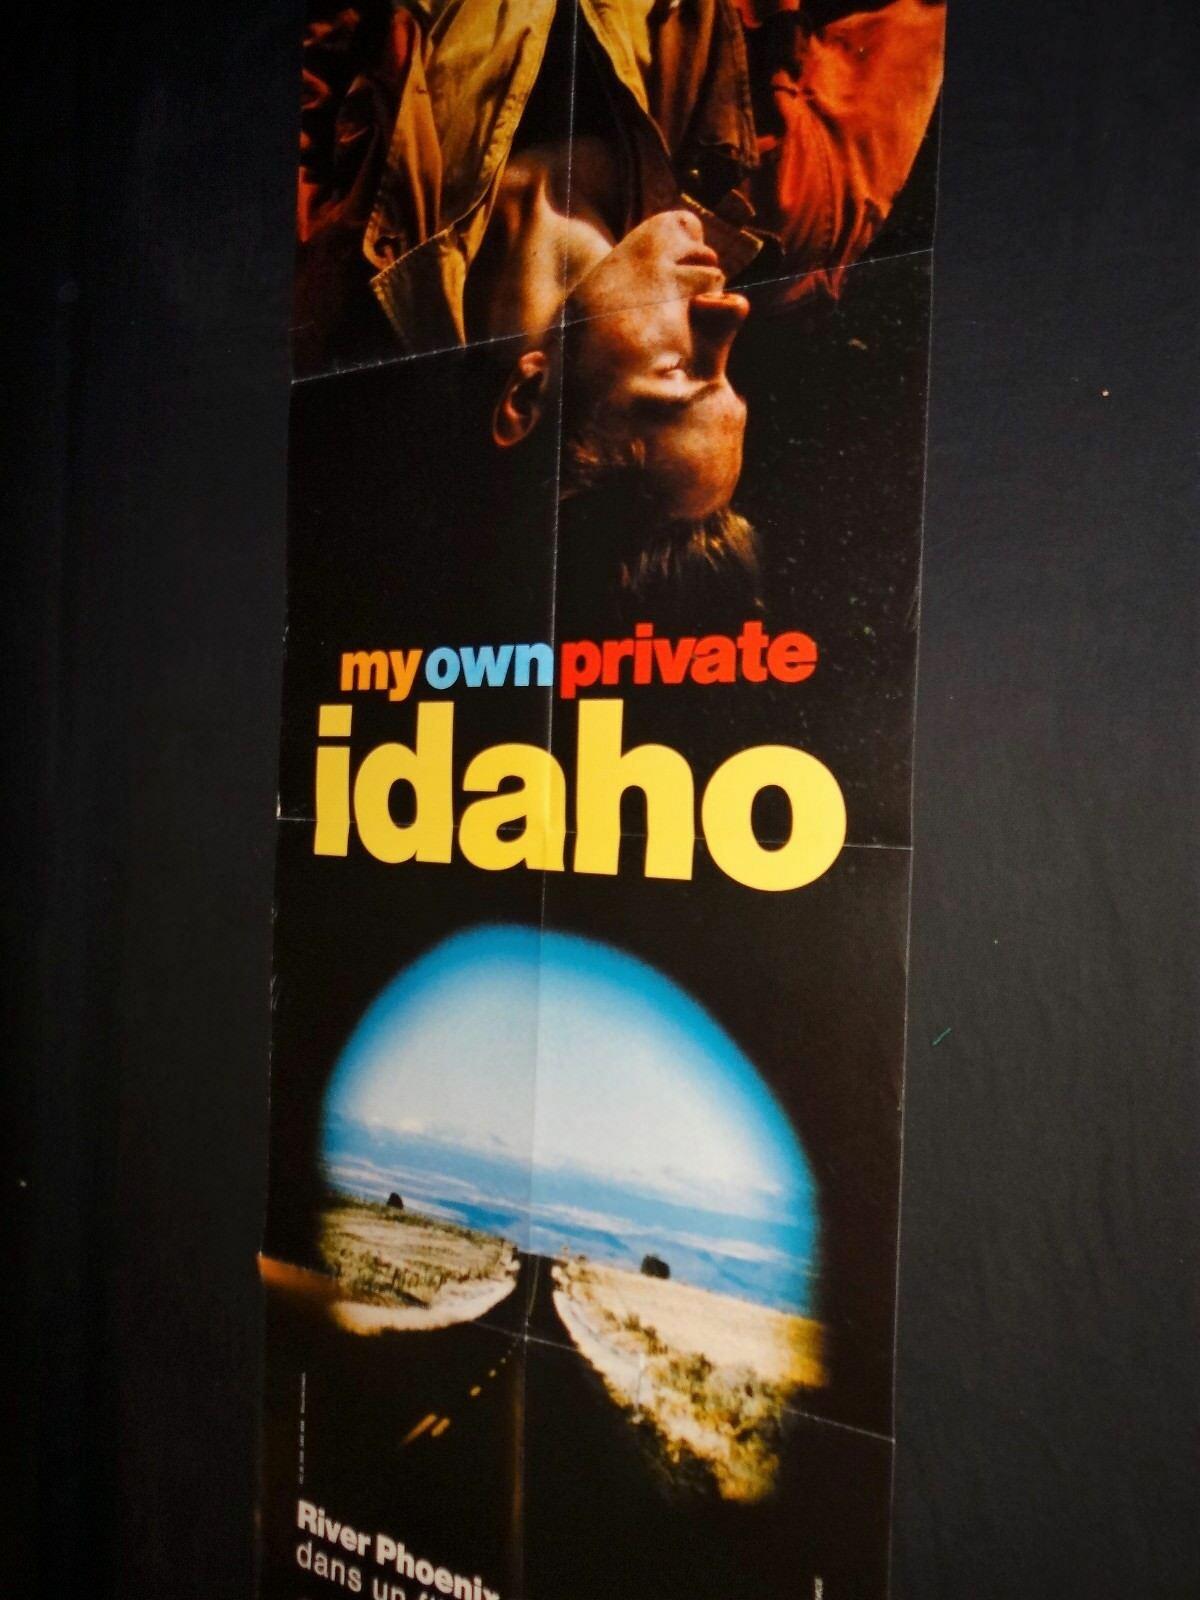 My Own Private Idaho Japanese French Pantalon poster.jpg